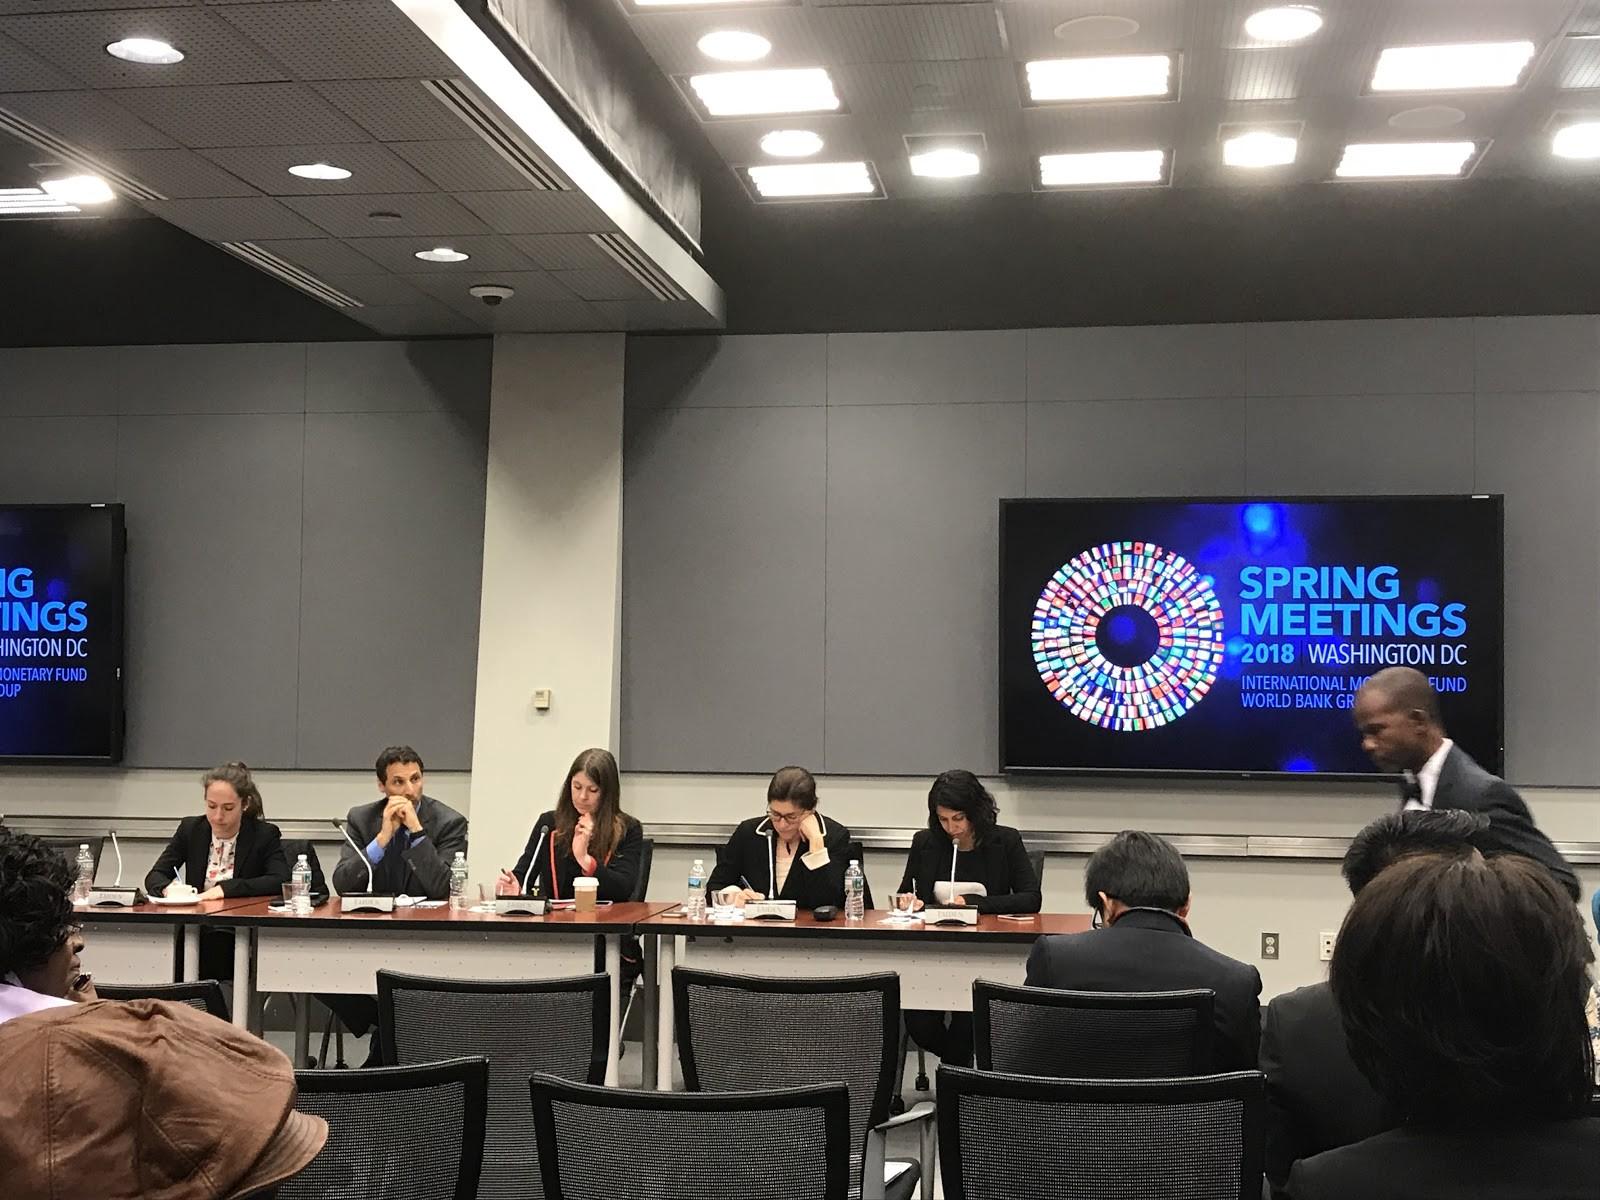 World Bank Accountability: A big shift still required to make The Big Shift